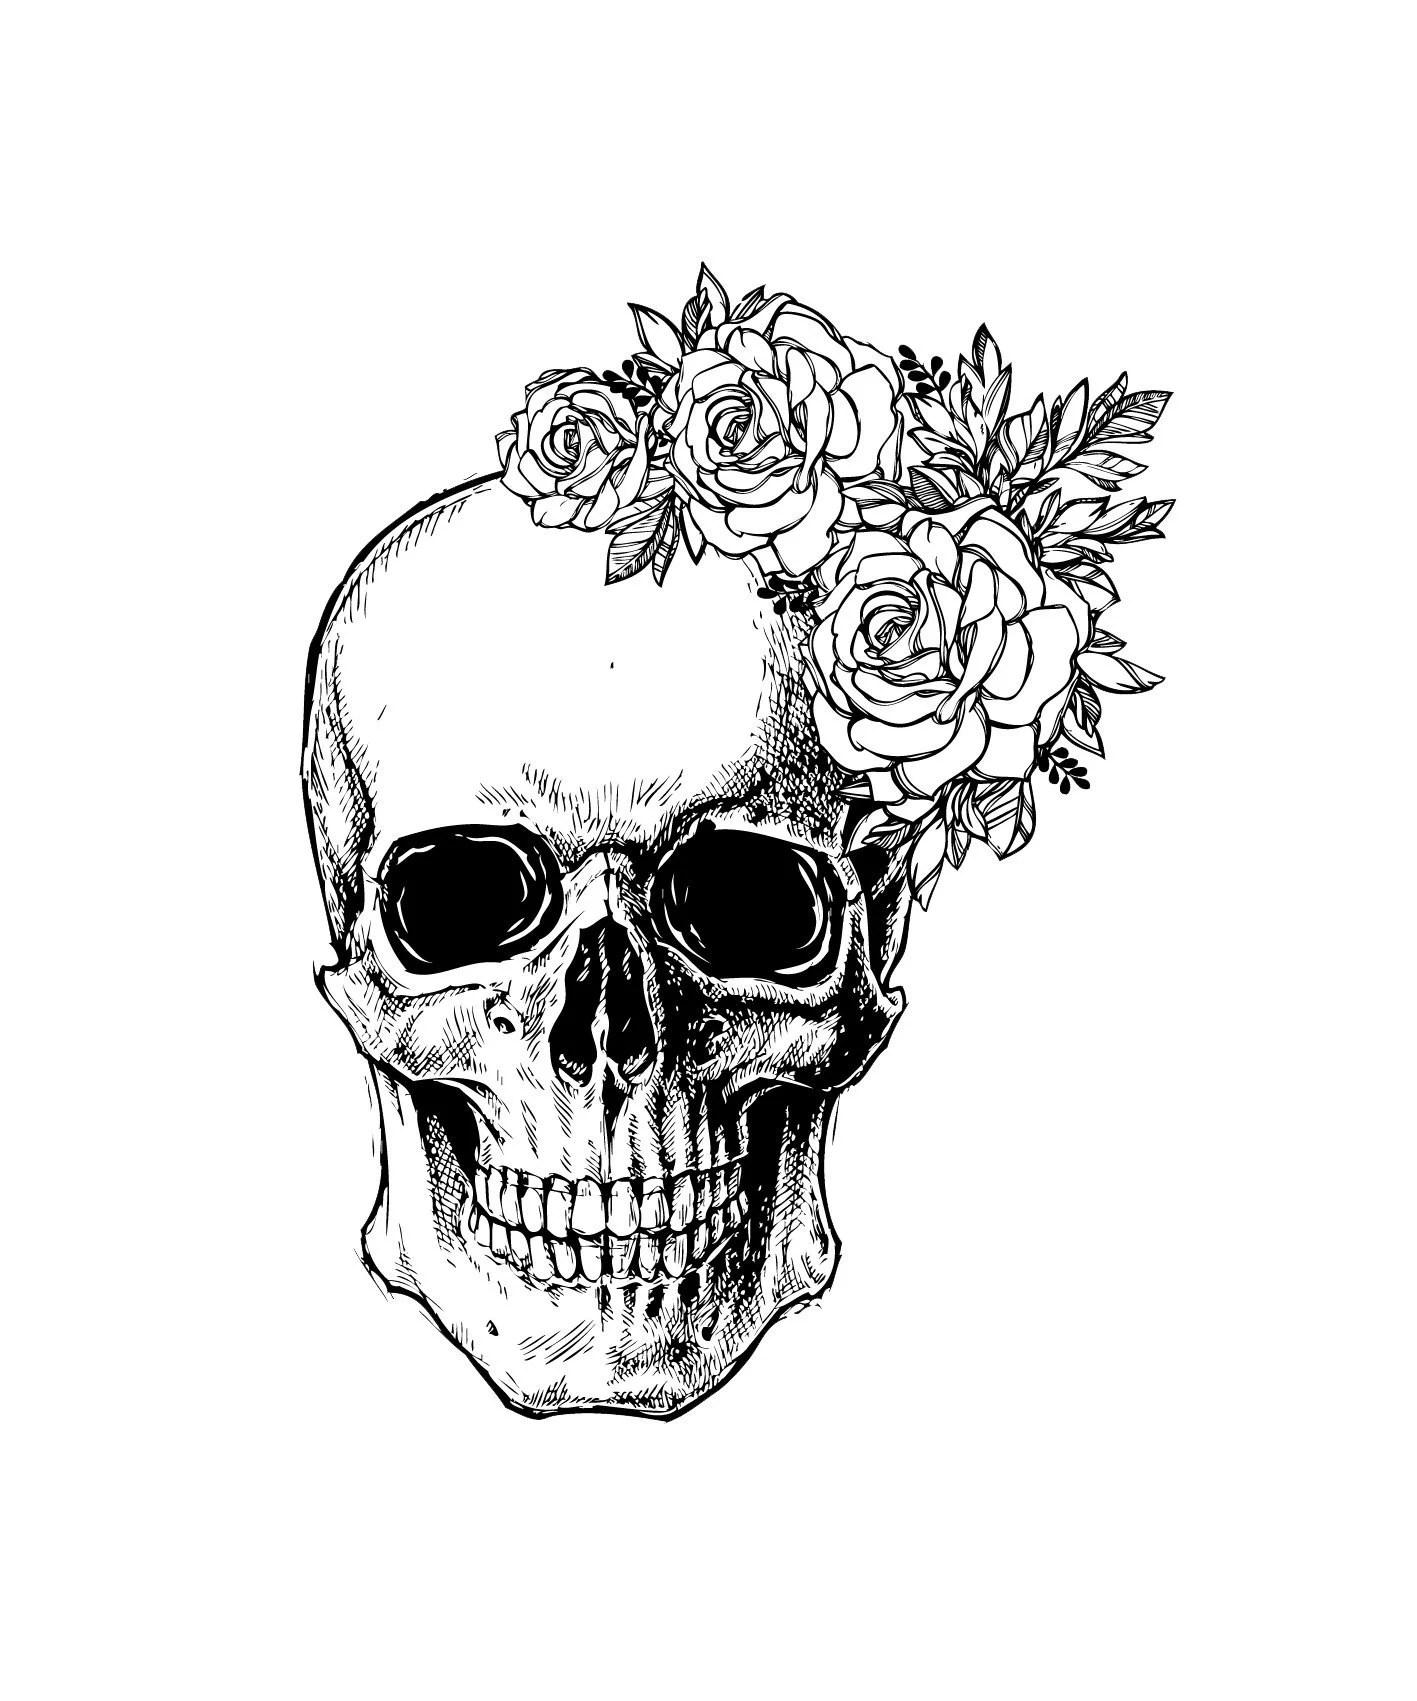 Skull svg file Flower Skull svg Skull cut file Floral